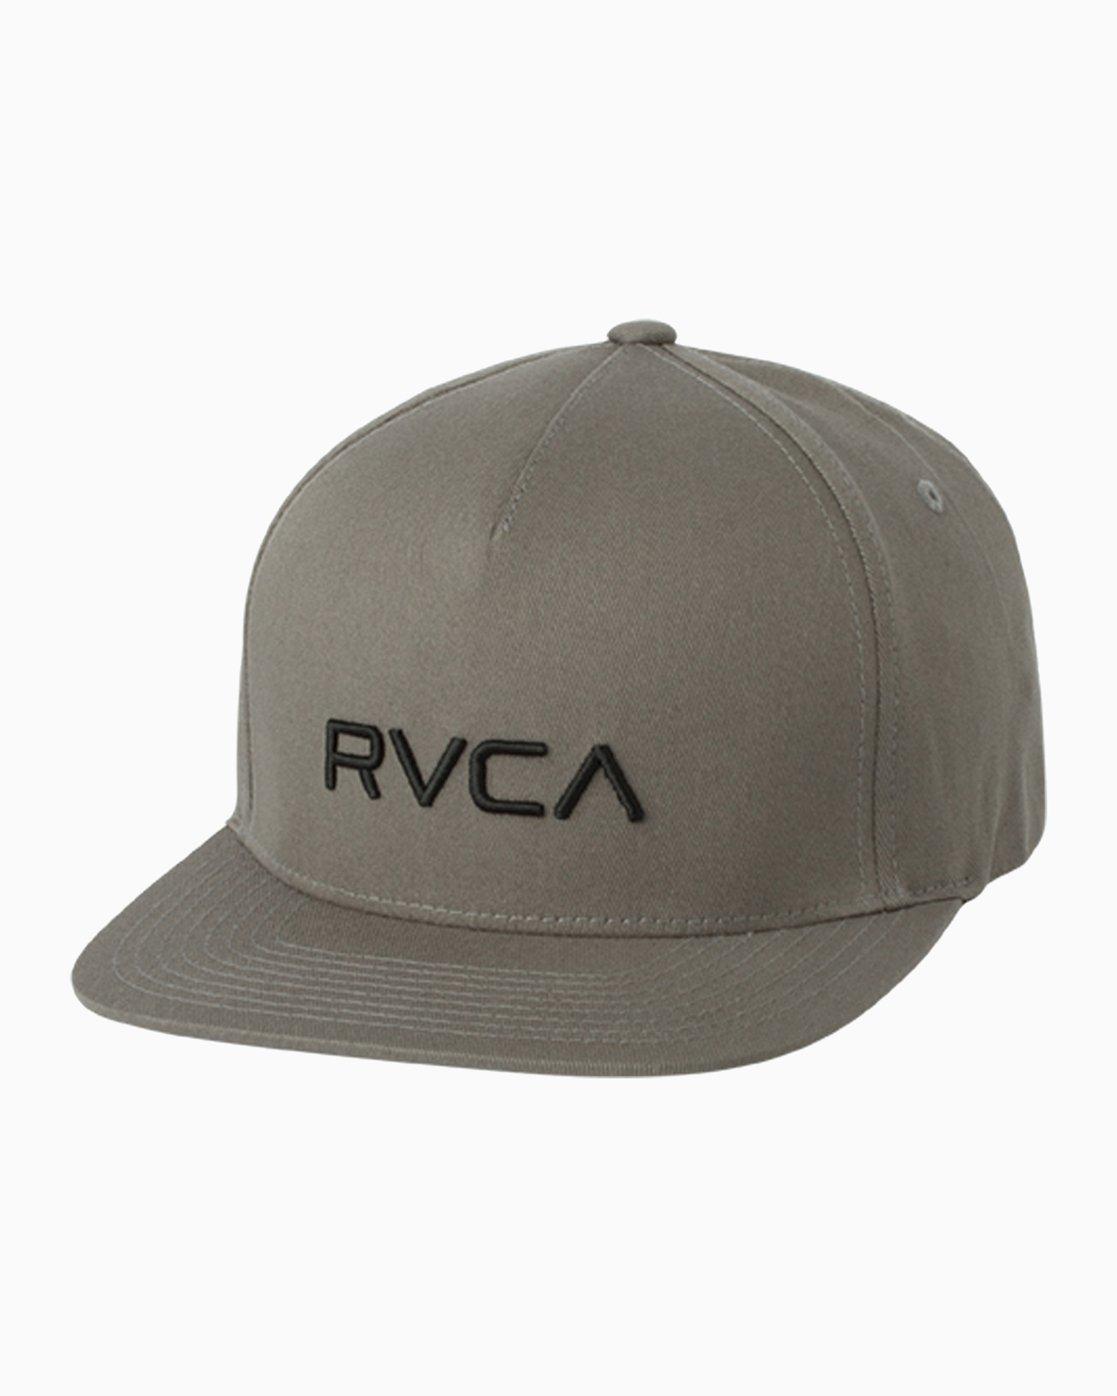 0 RVCA Sport Flexfit Hat Grey MAHWQRSF RVCA f39a44ca76f